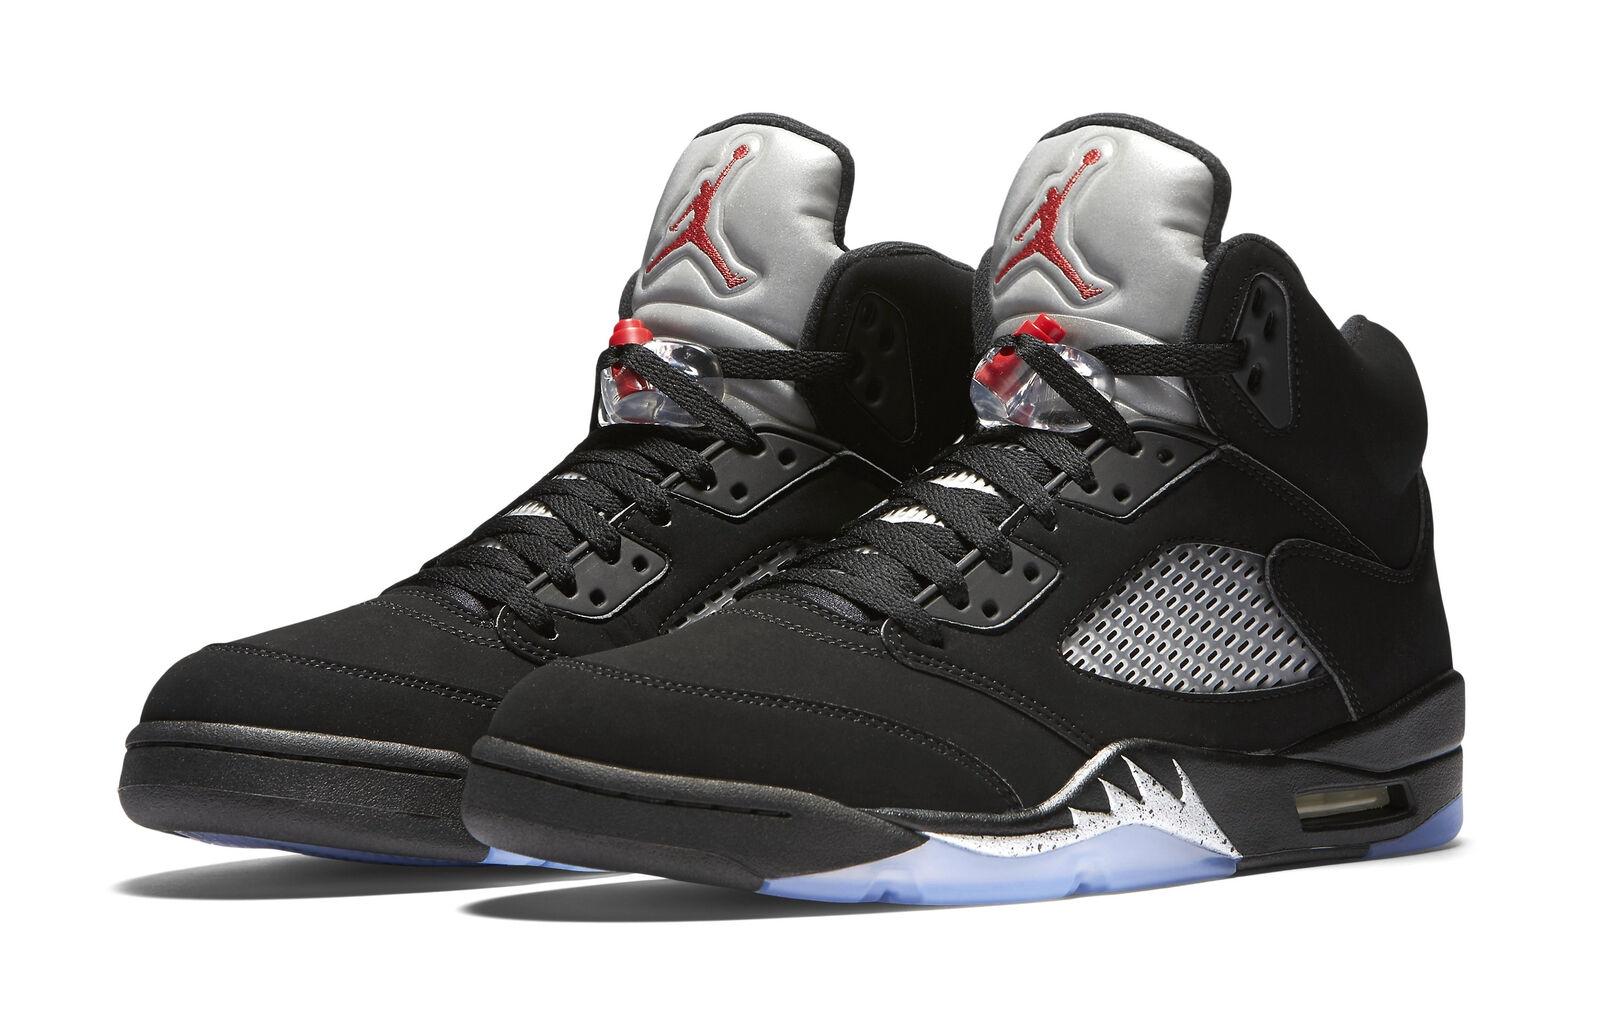 Nike air jordan retro 5 scarpe da uomo, volume 15, nero / argento metallico